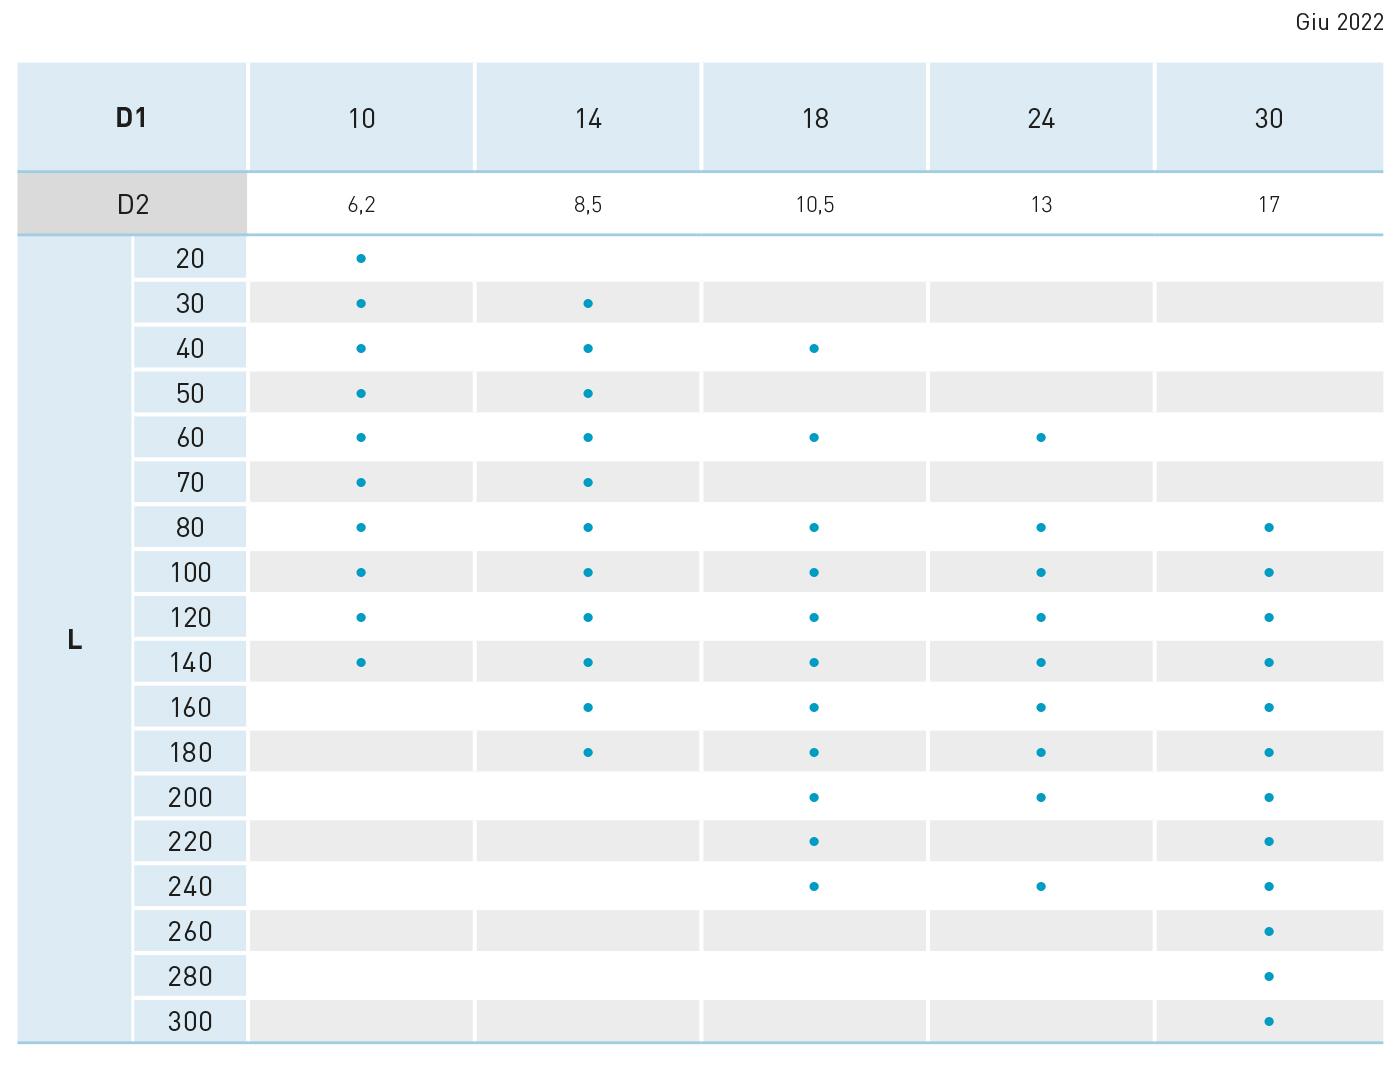 tabella guida liscia T022